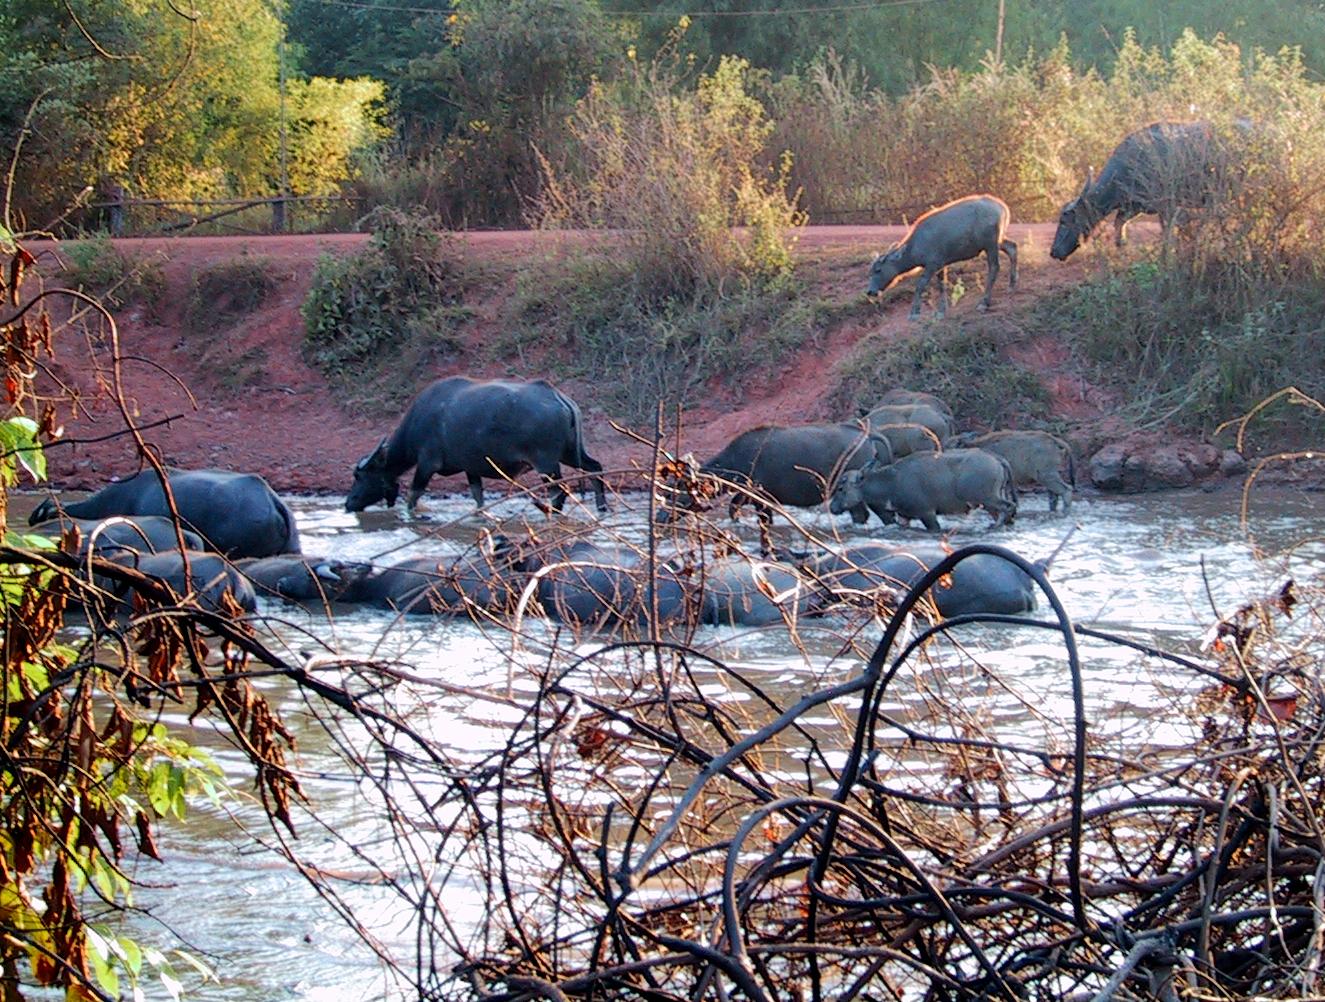 Water buffalo02.jpg